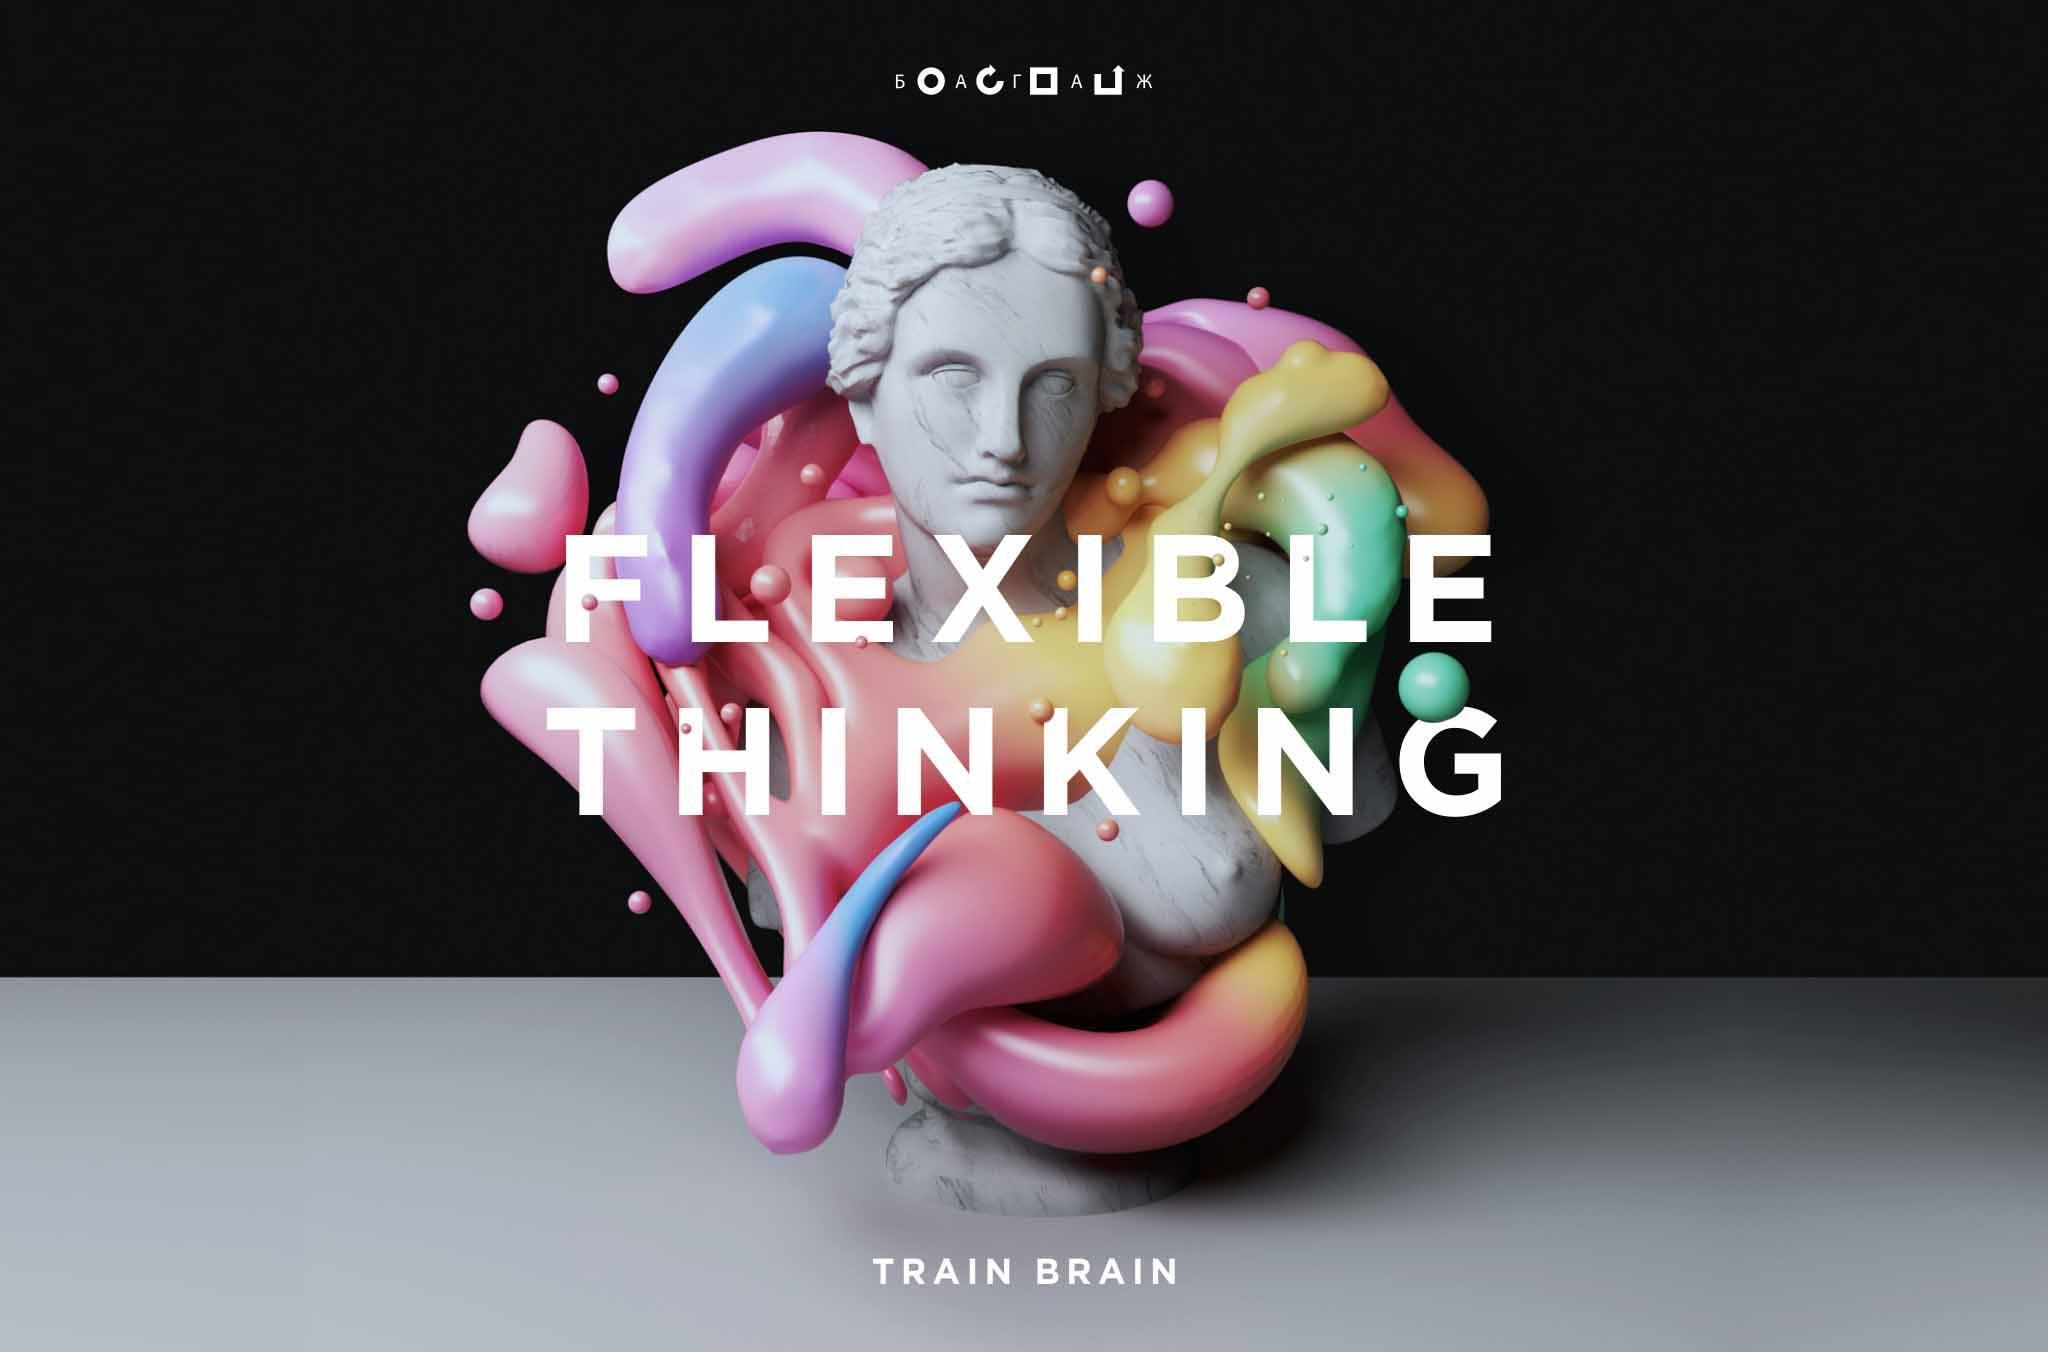 01_ИЮНЬ_FLEXIBLE THINKING